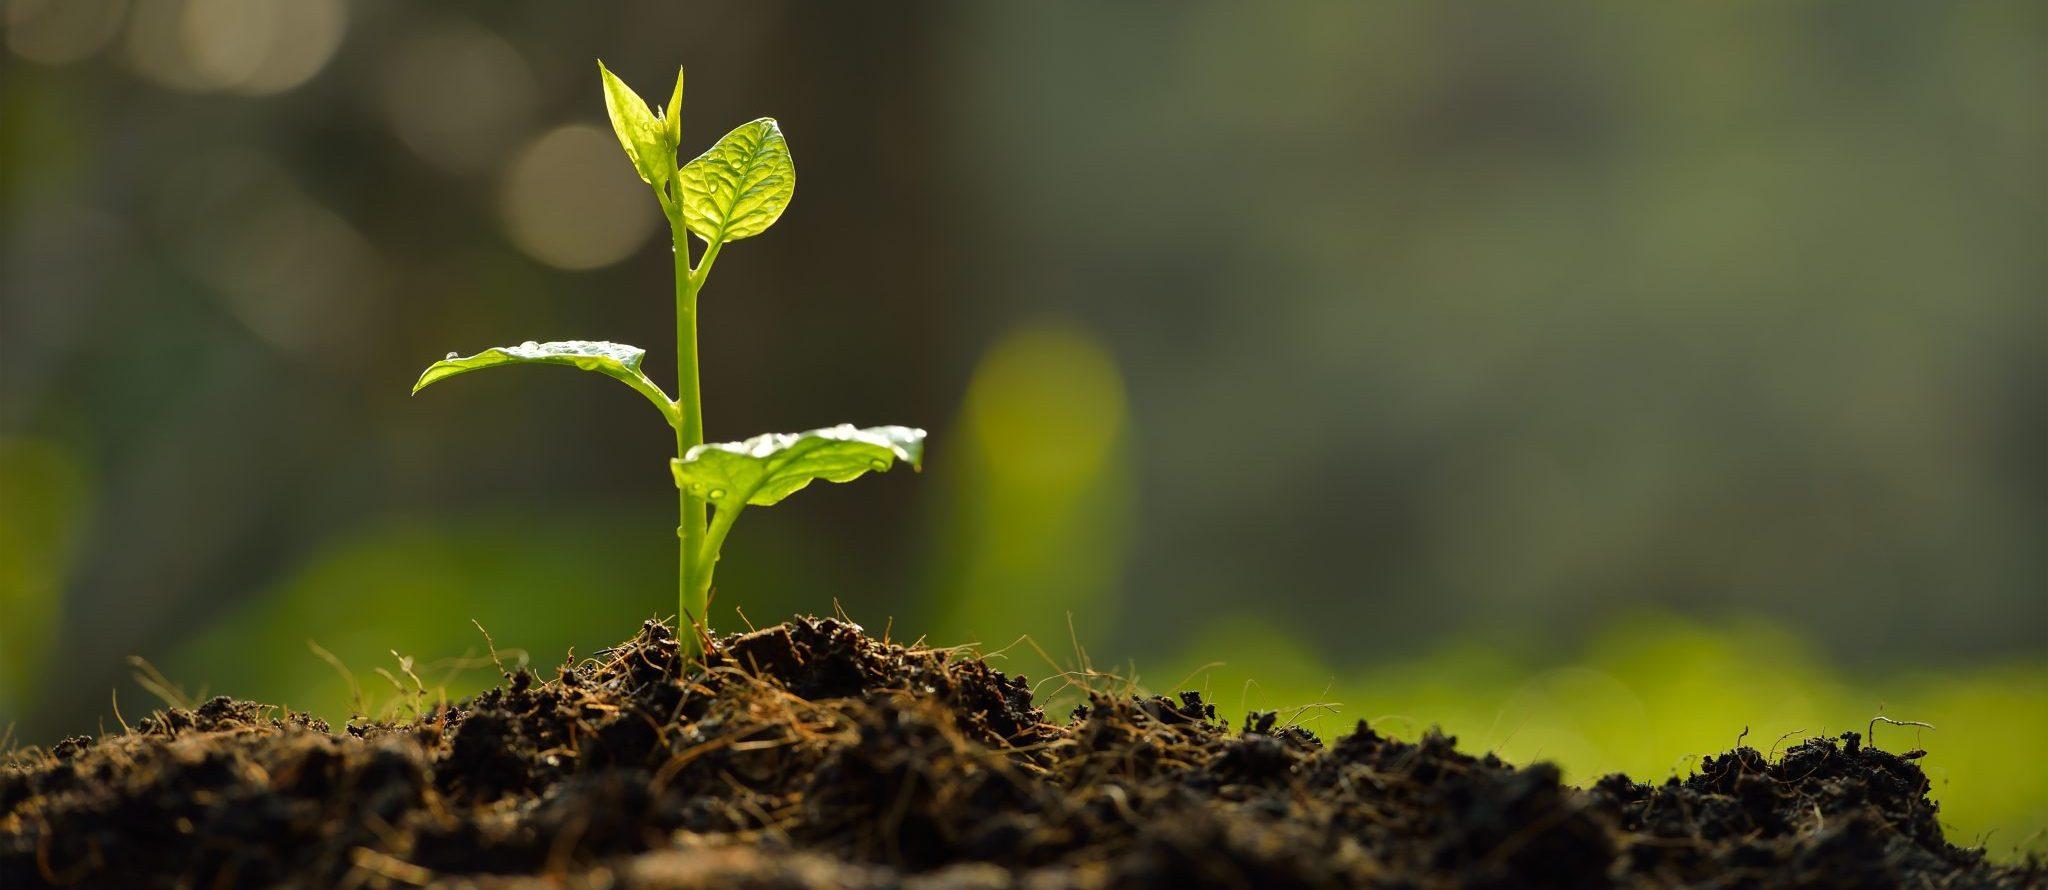 Garden plant growing in the soil